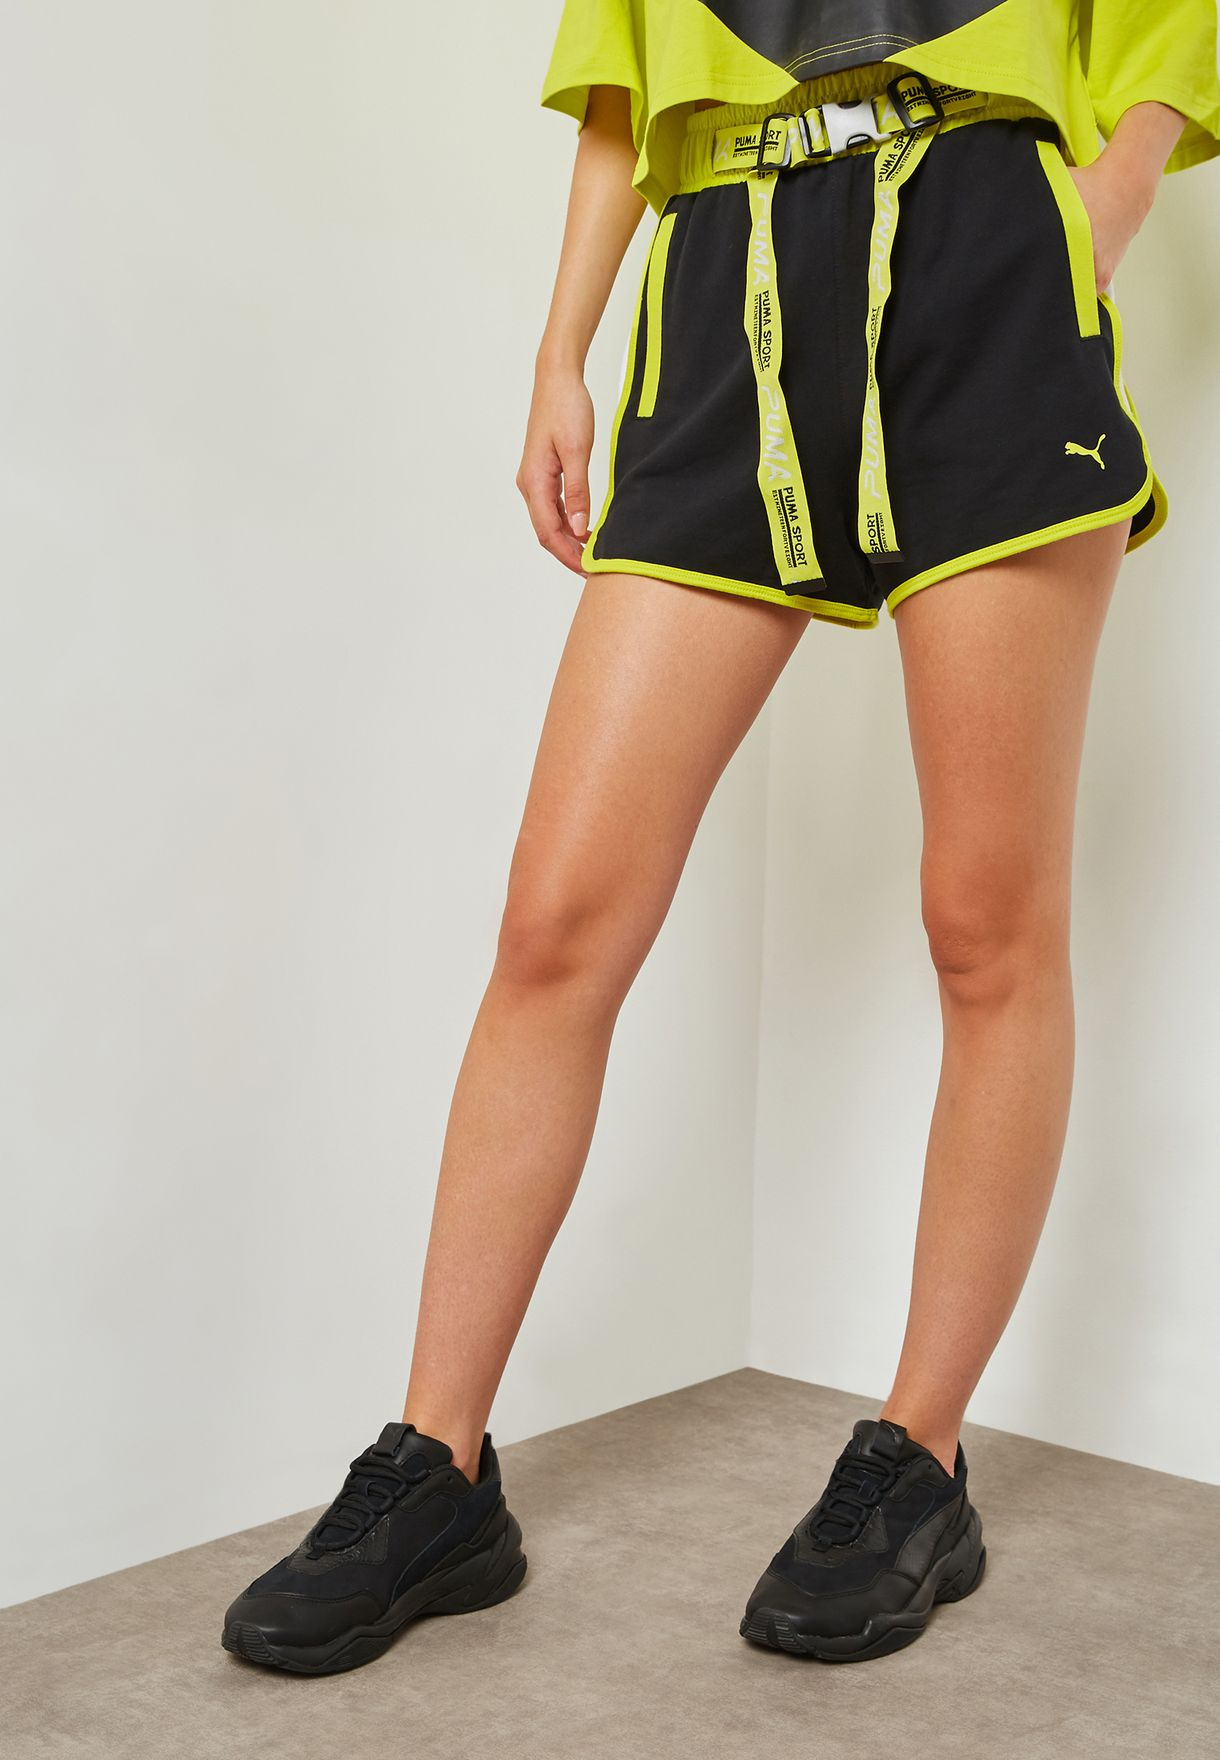 capitale Bollire Incasinato  Buy PUMA multicolor Xtreme Tape Highwaist Shorts for Women in MENA,  Worldwide | 57738301